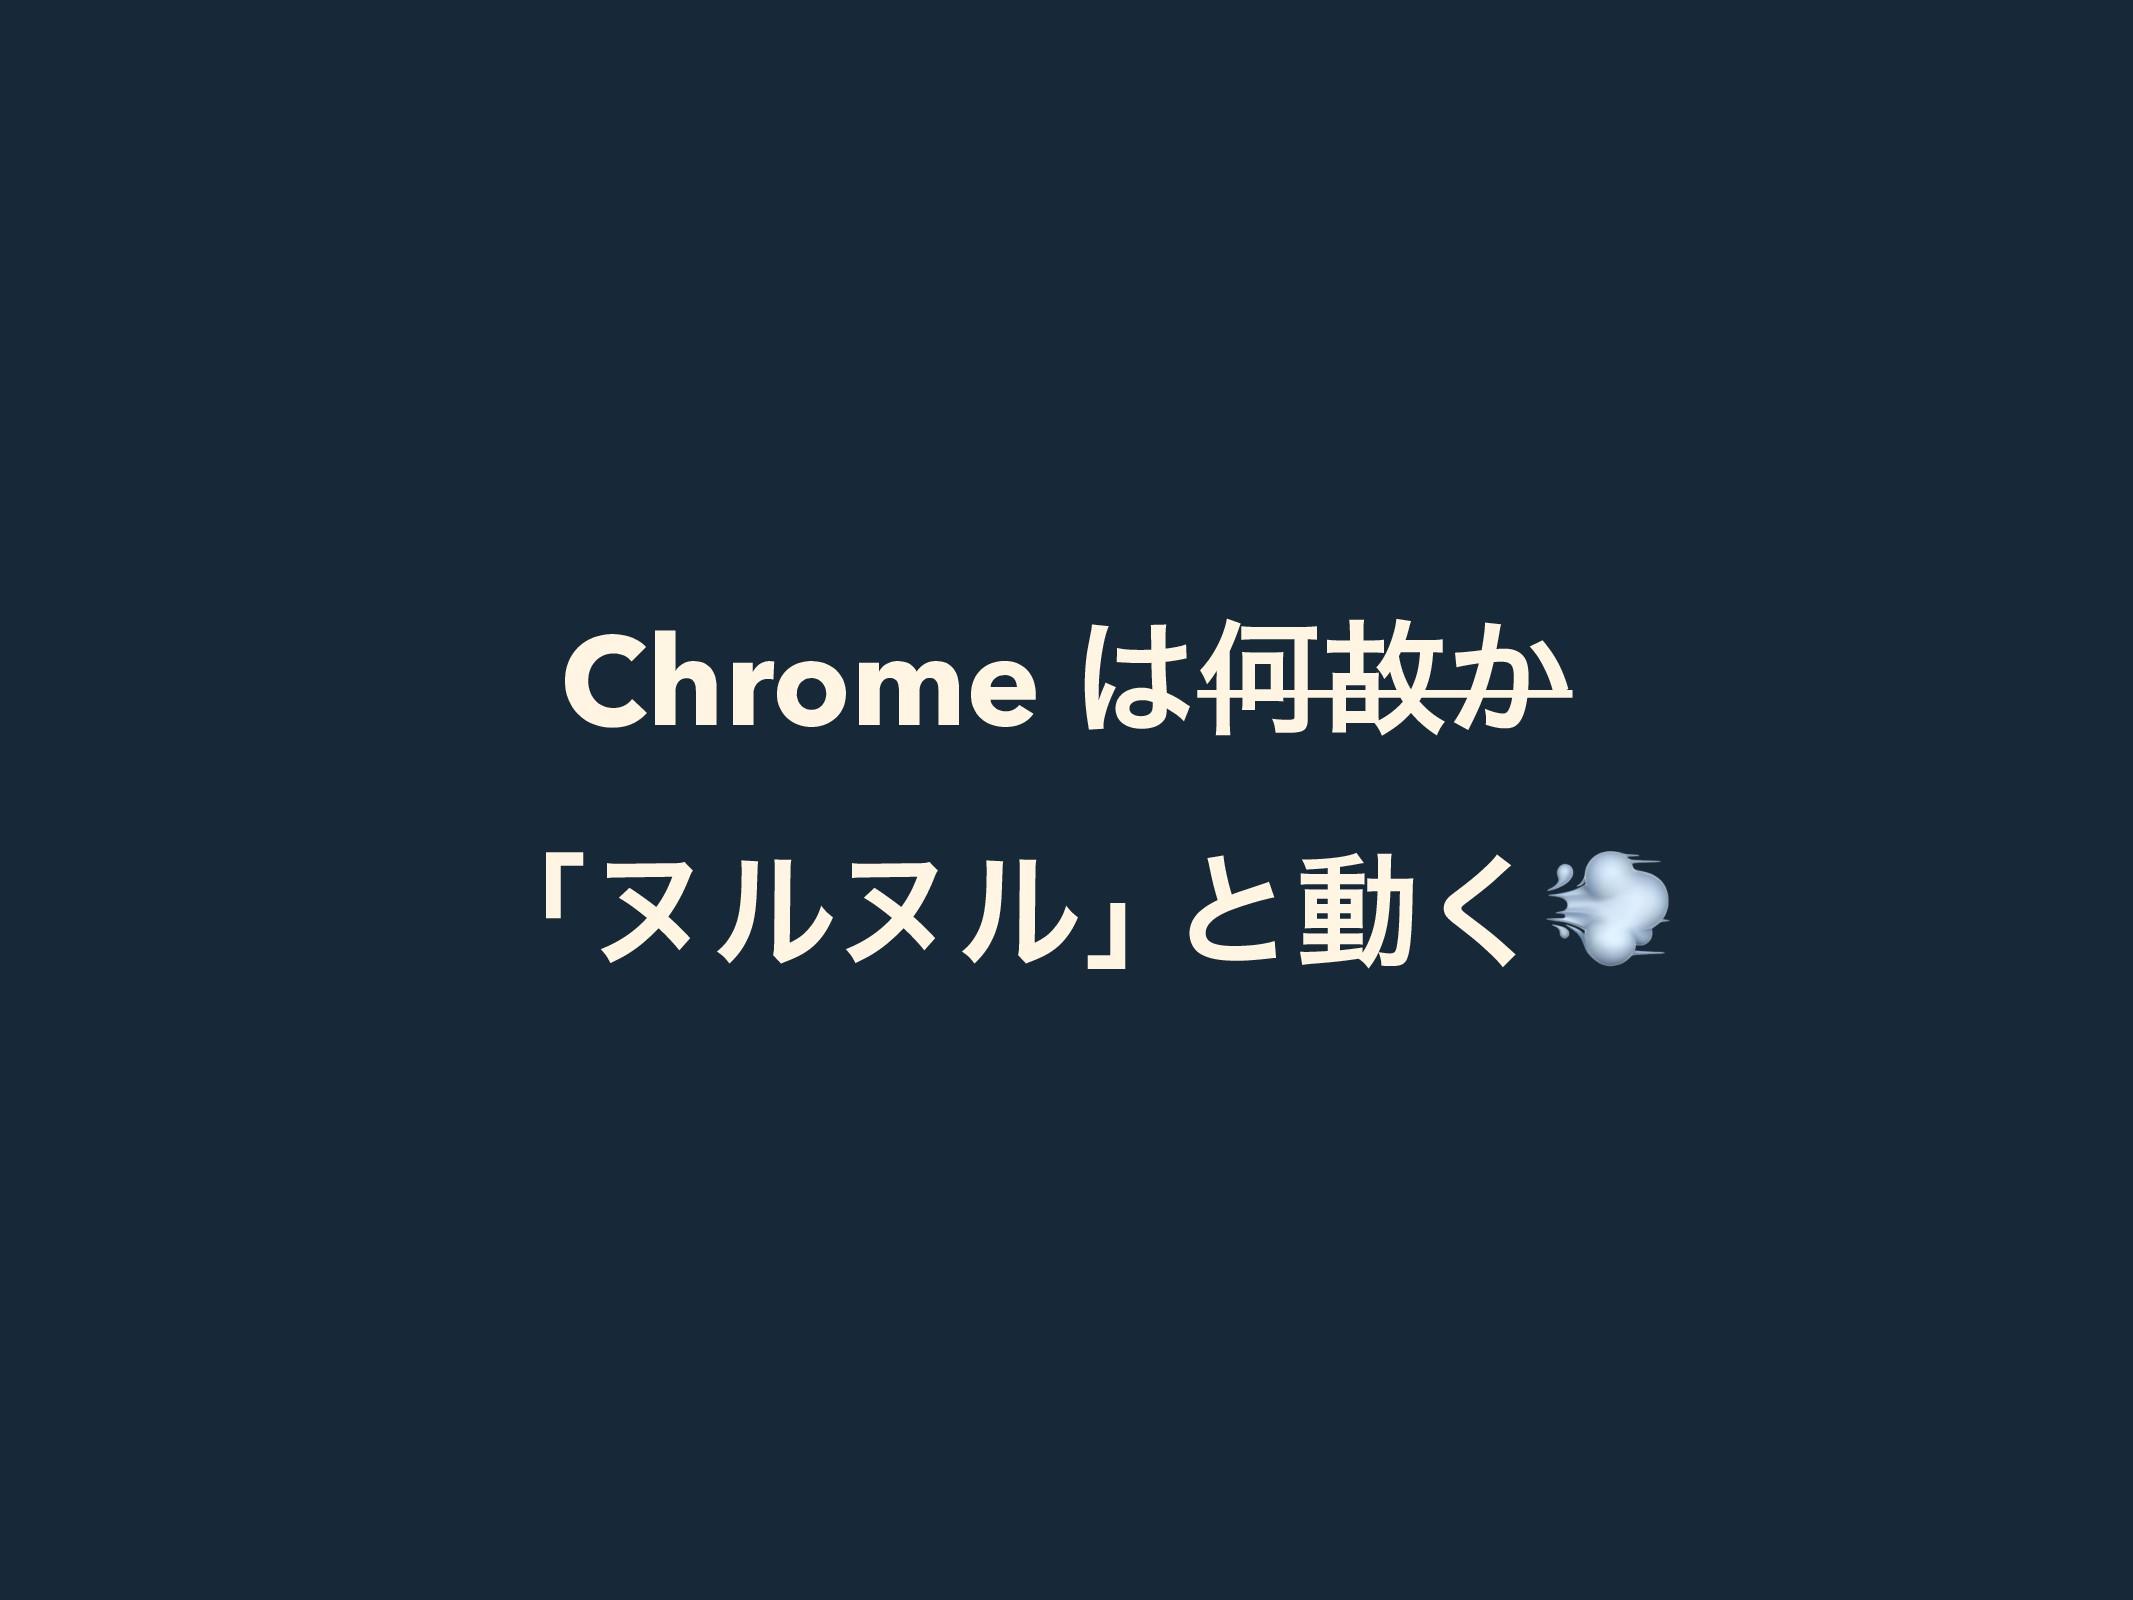 Chrome Կނ͔ ʮψϧψϧʯ ͱಈ͘